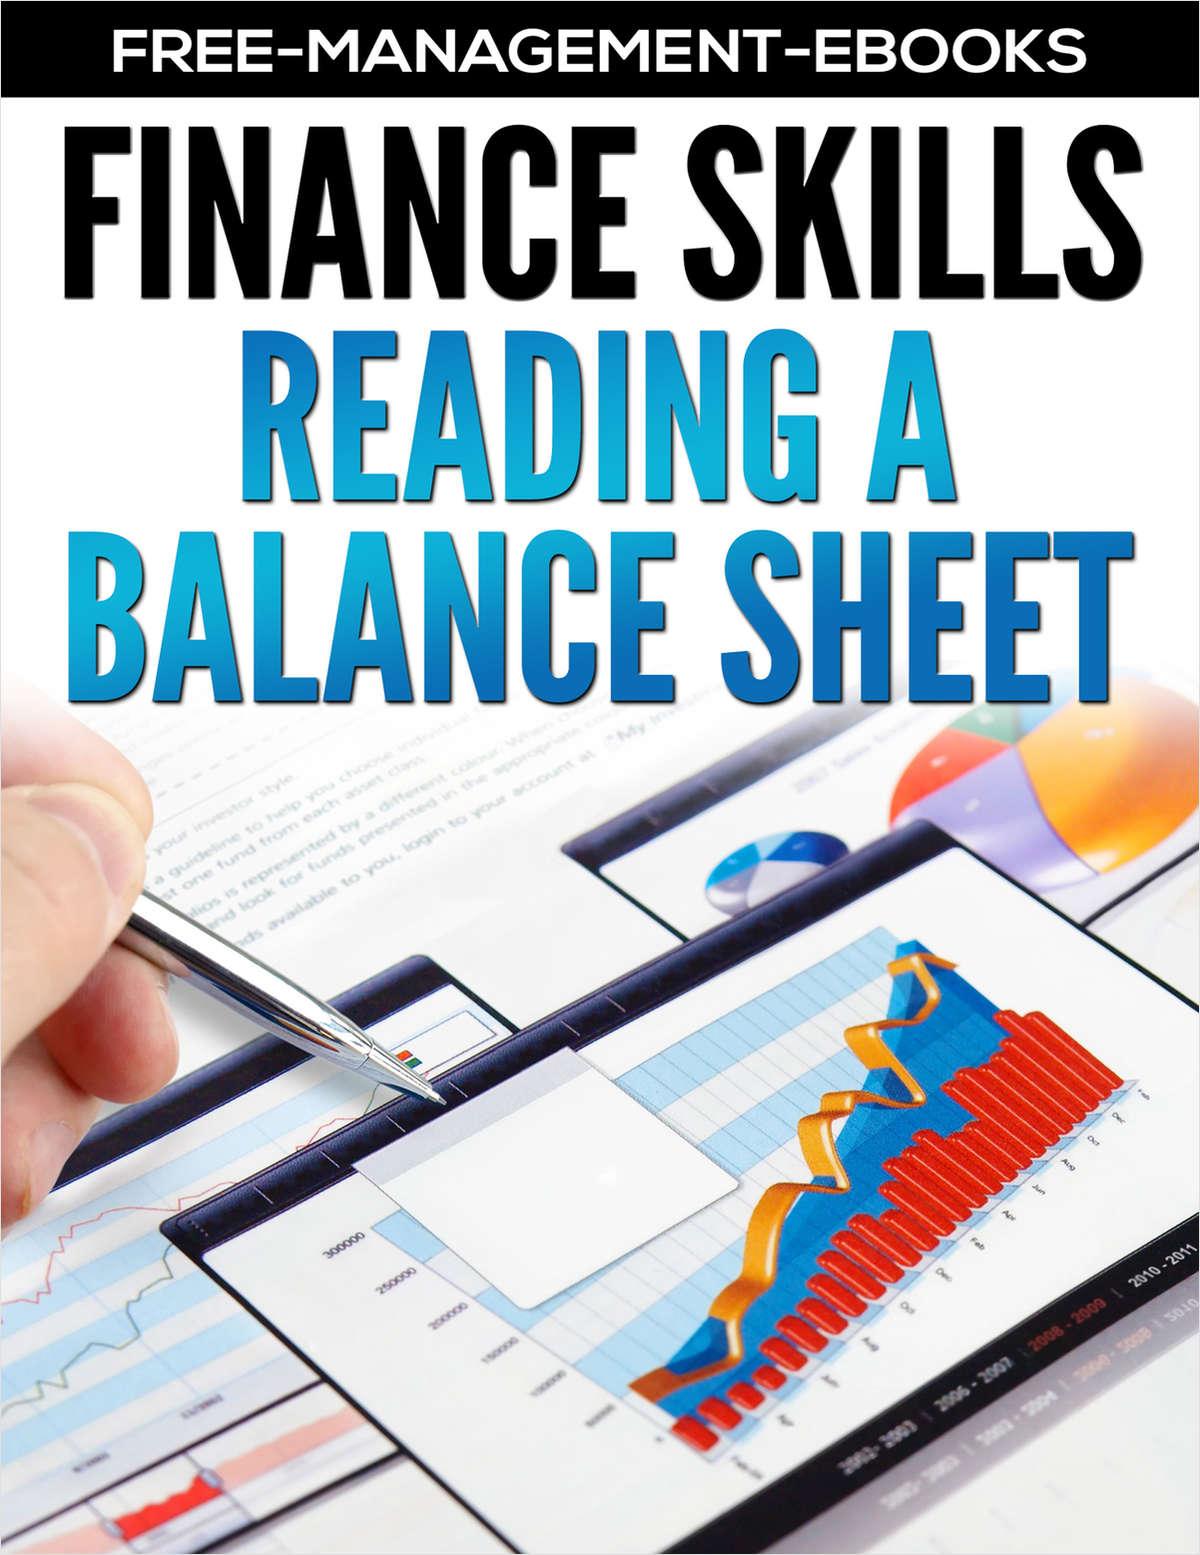 Reading A Balance Sheet -- Developing your Finance Skills